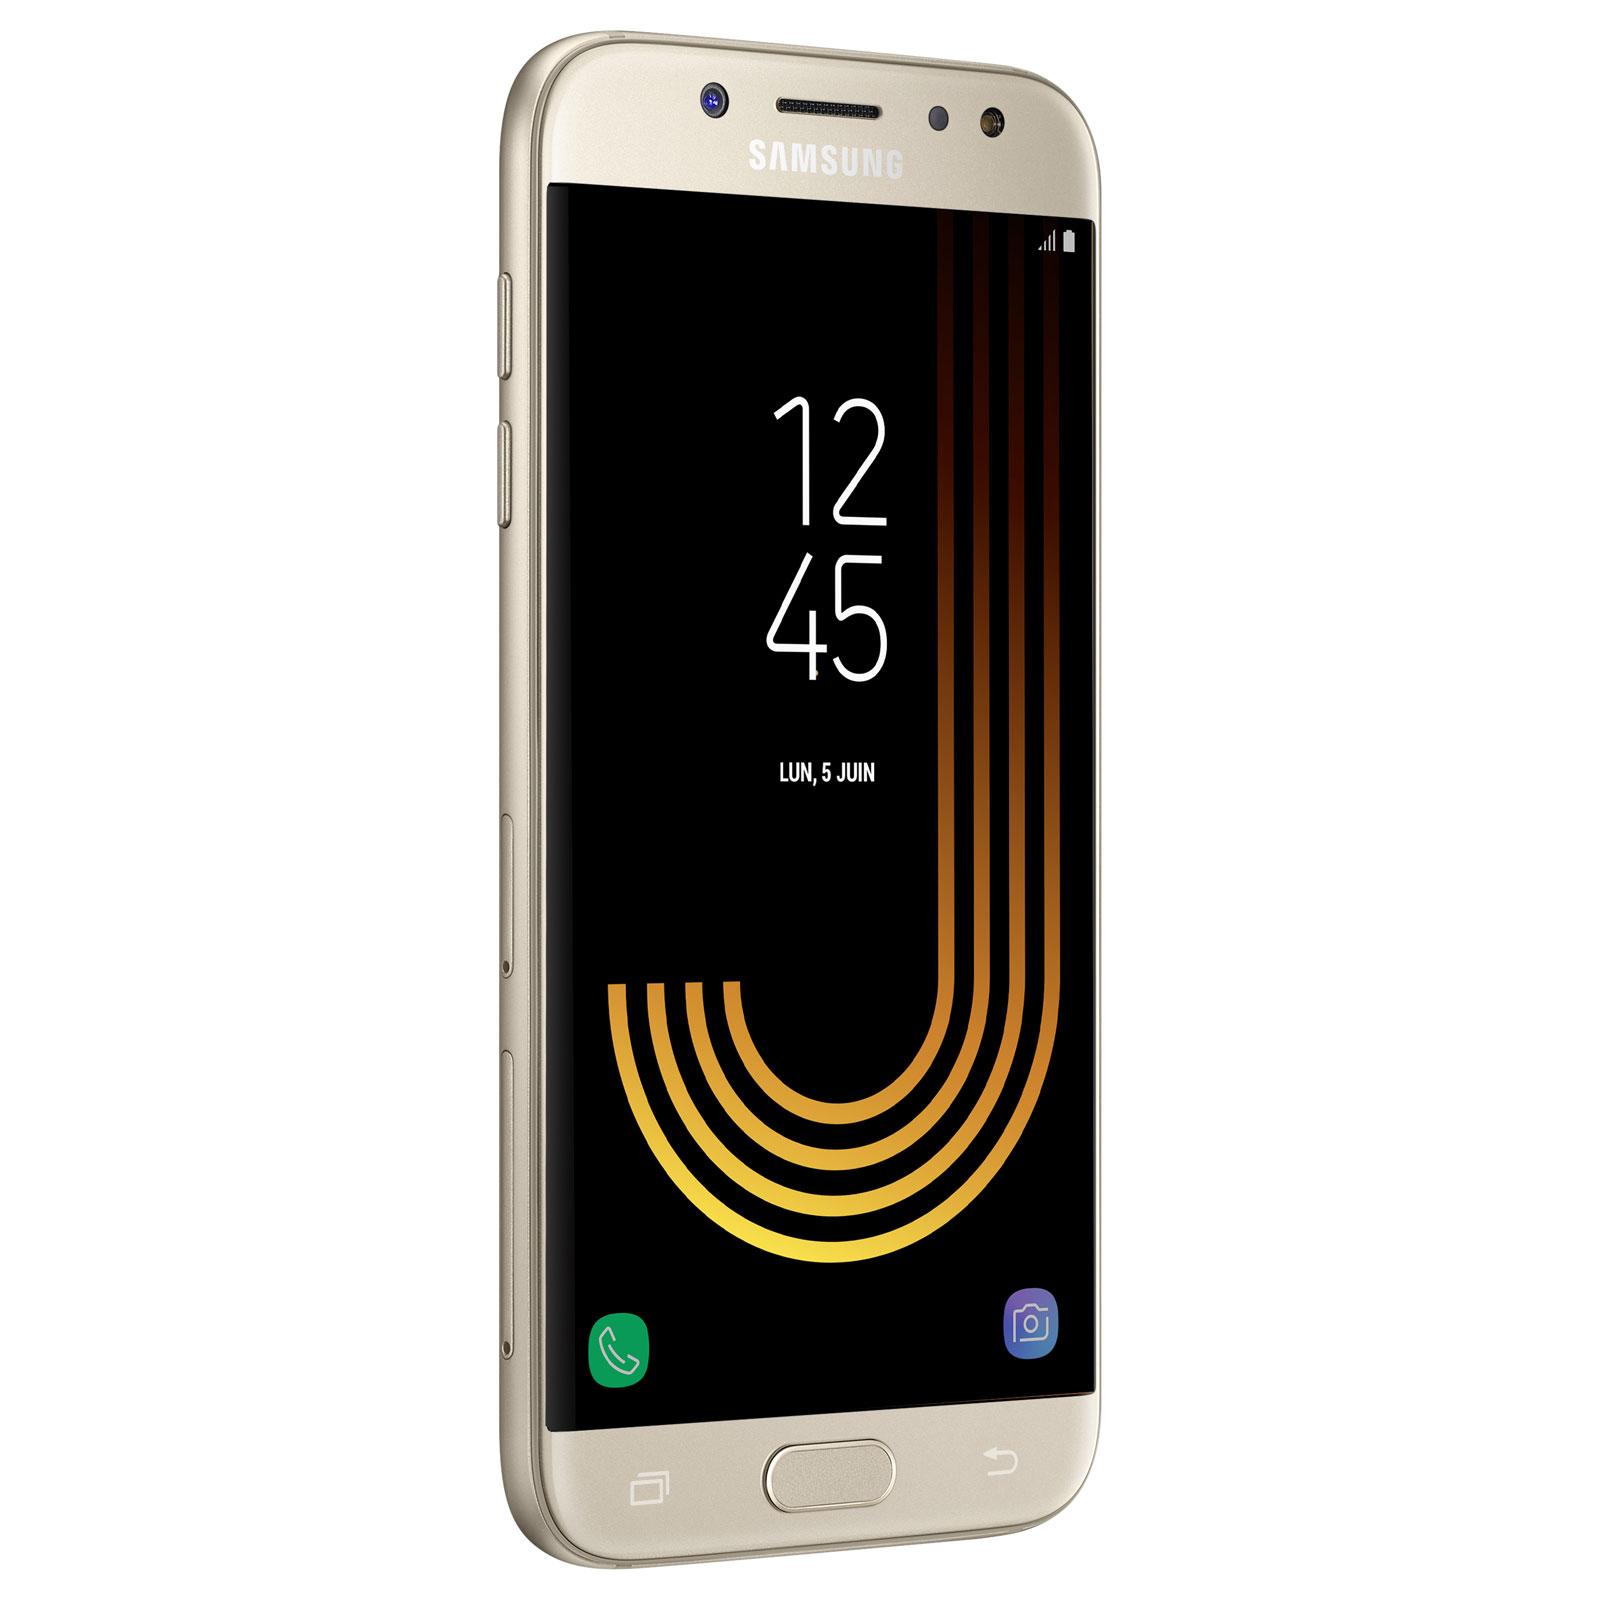 Samsung Galaxy J5 (2017) 16Go J530 Gold (SM-J530FZDAXEF) - Achat / Vente Téléphonie sur Cybertek.fr - 4